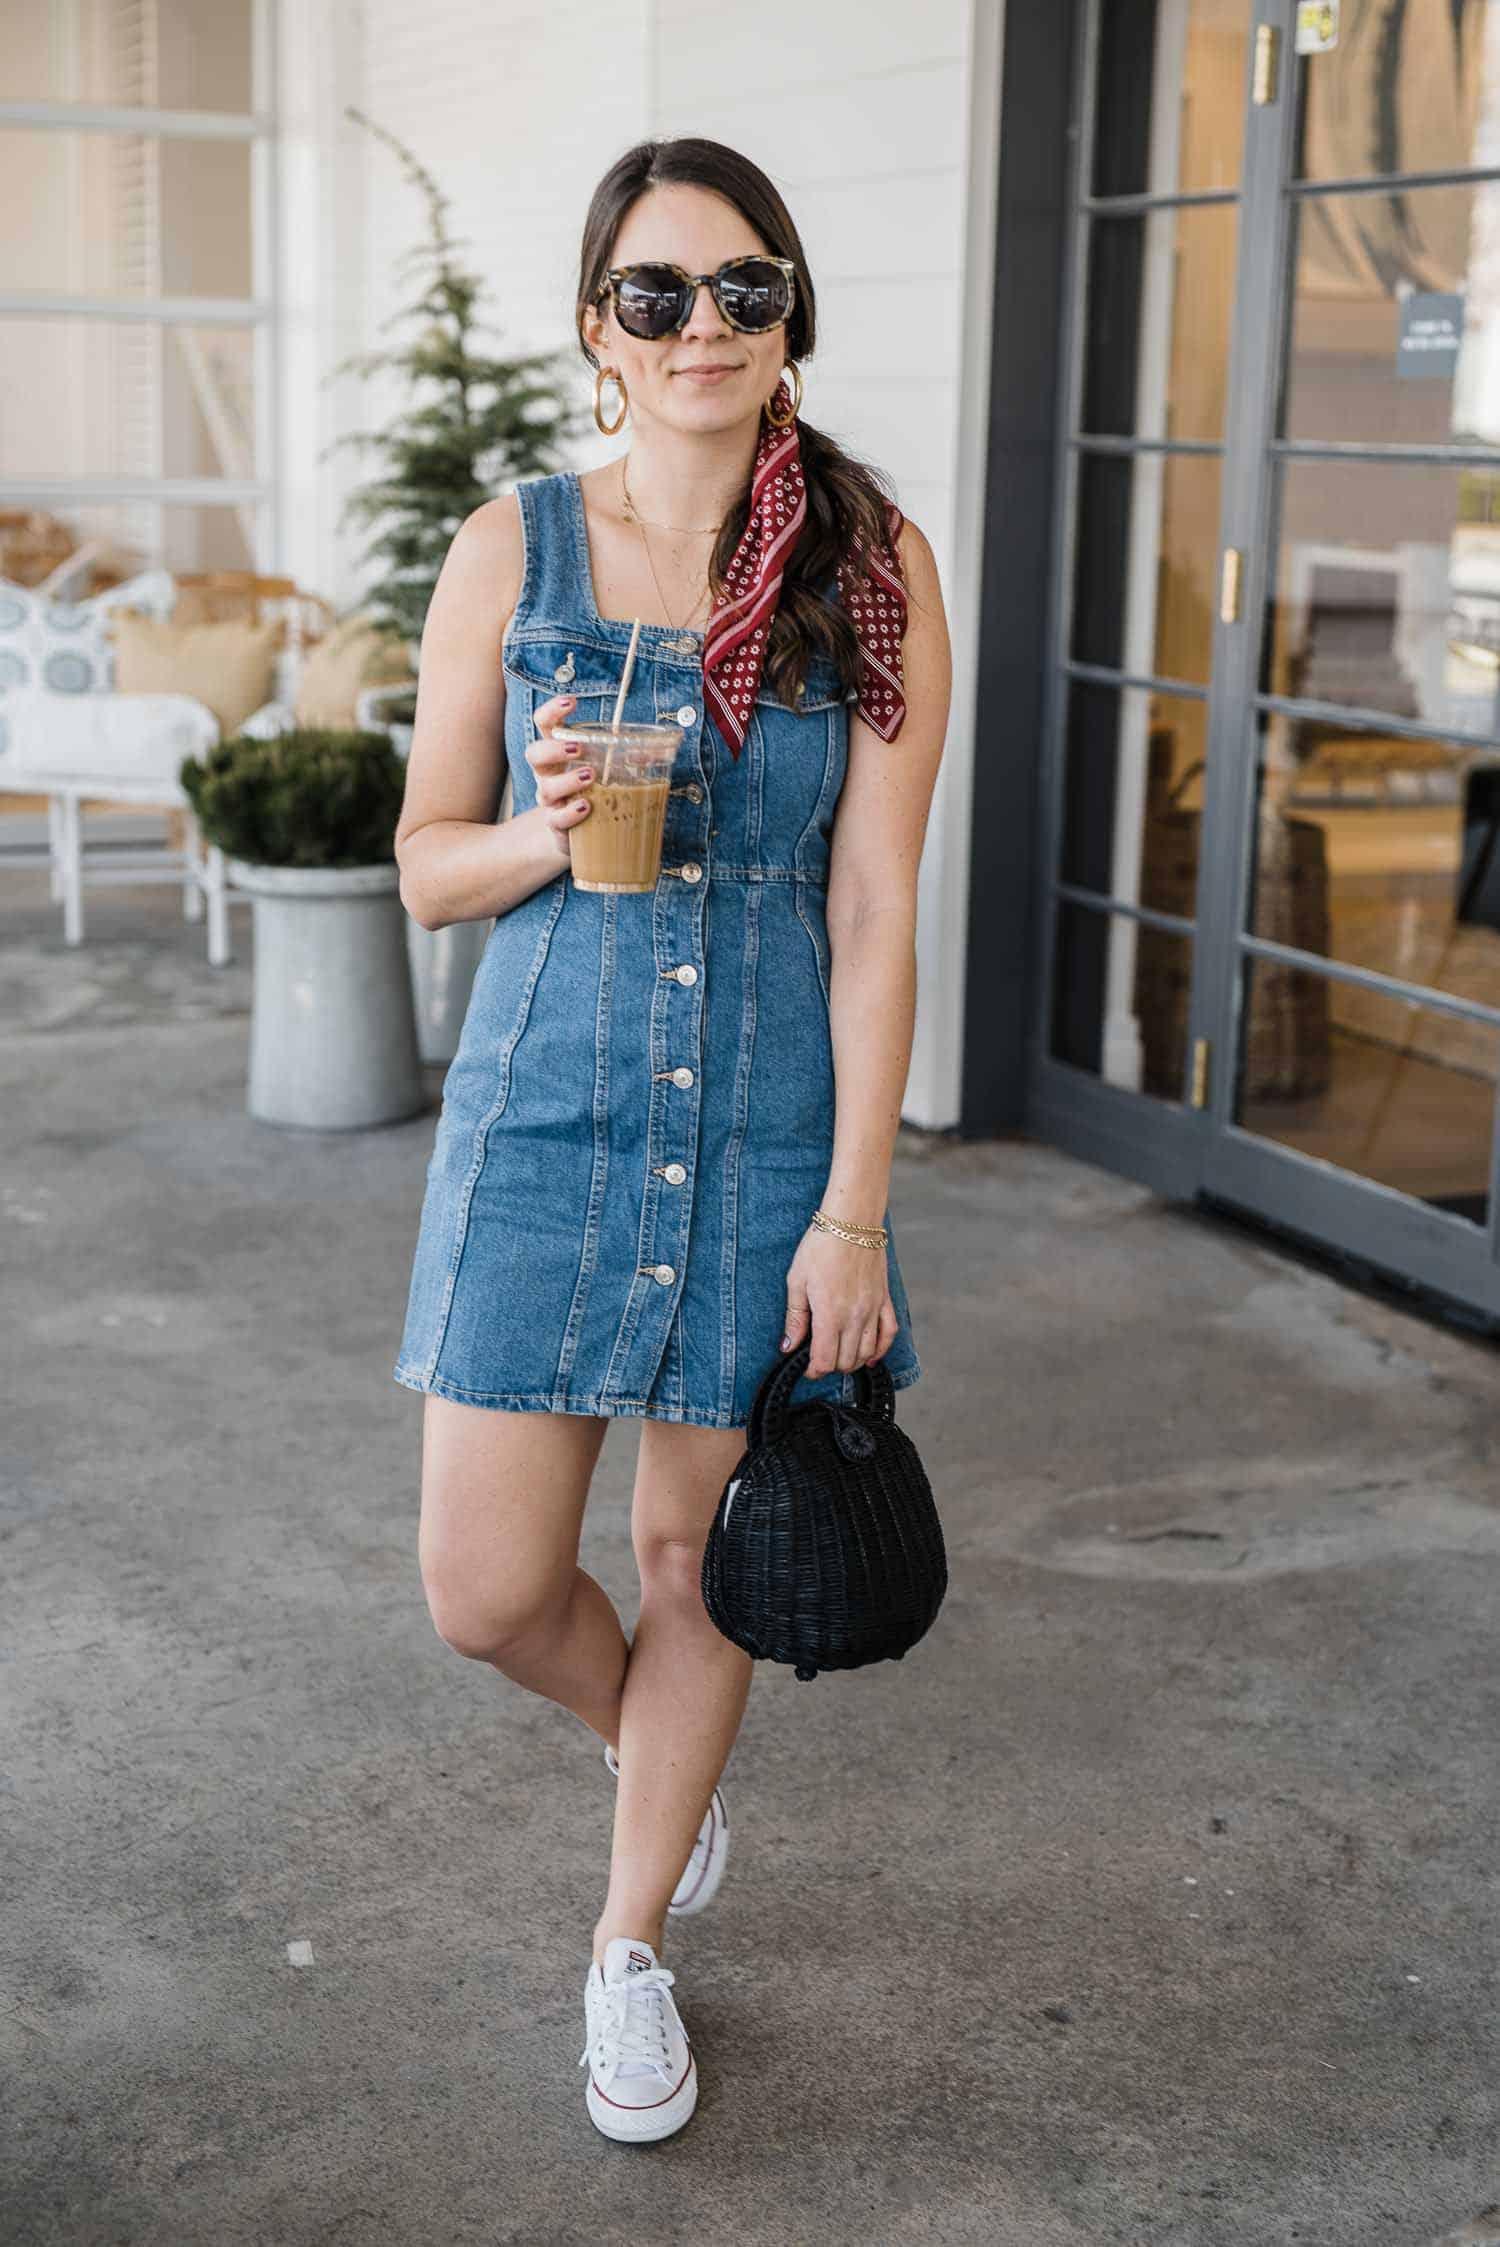 Denim dress outfit ideas for spring by Jessica Camerata